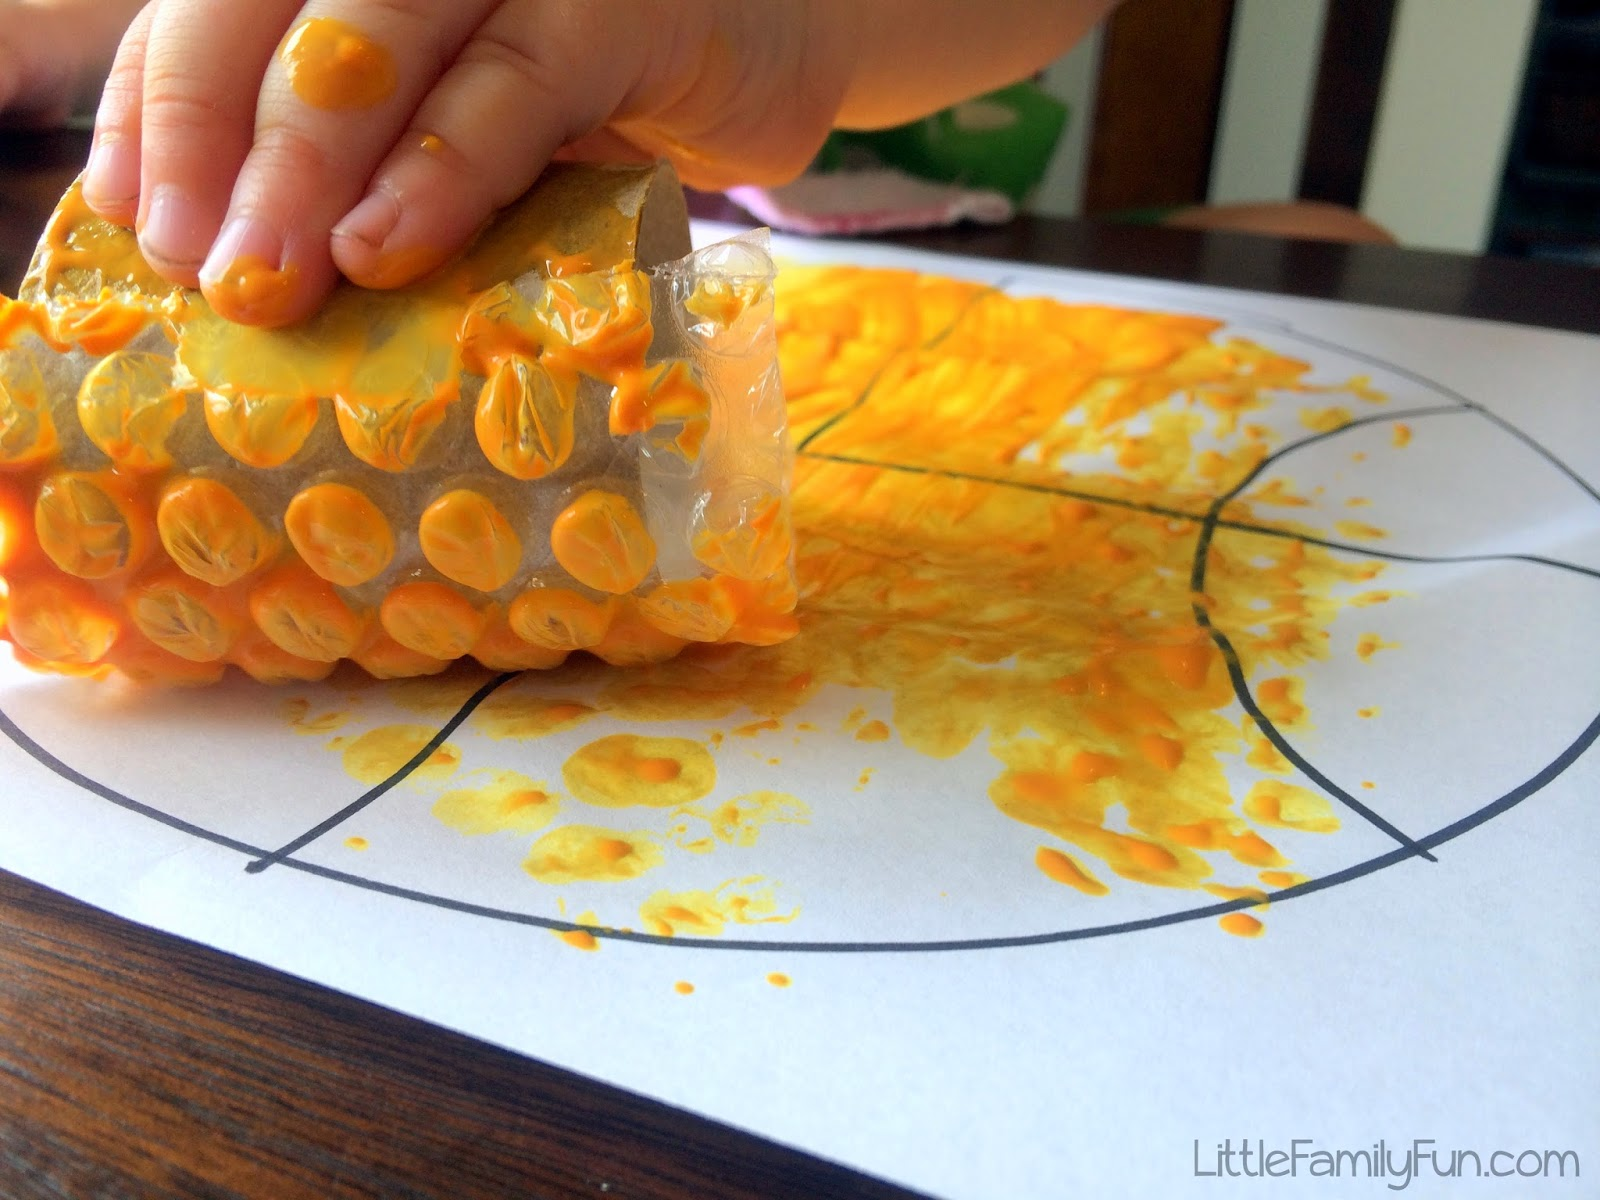 Little family fun basketball craft for kids - Cuisine soort ...